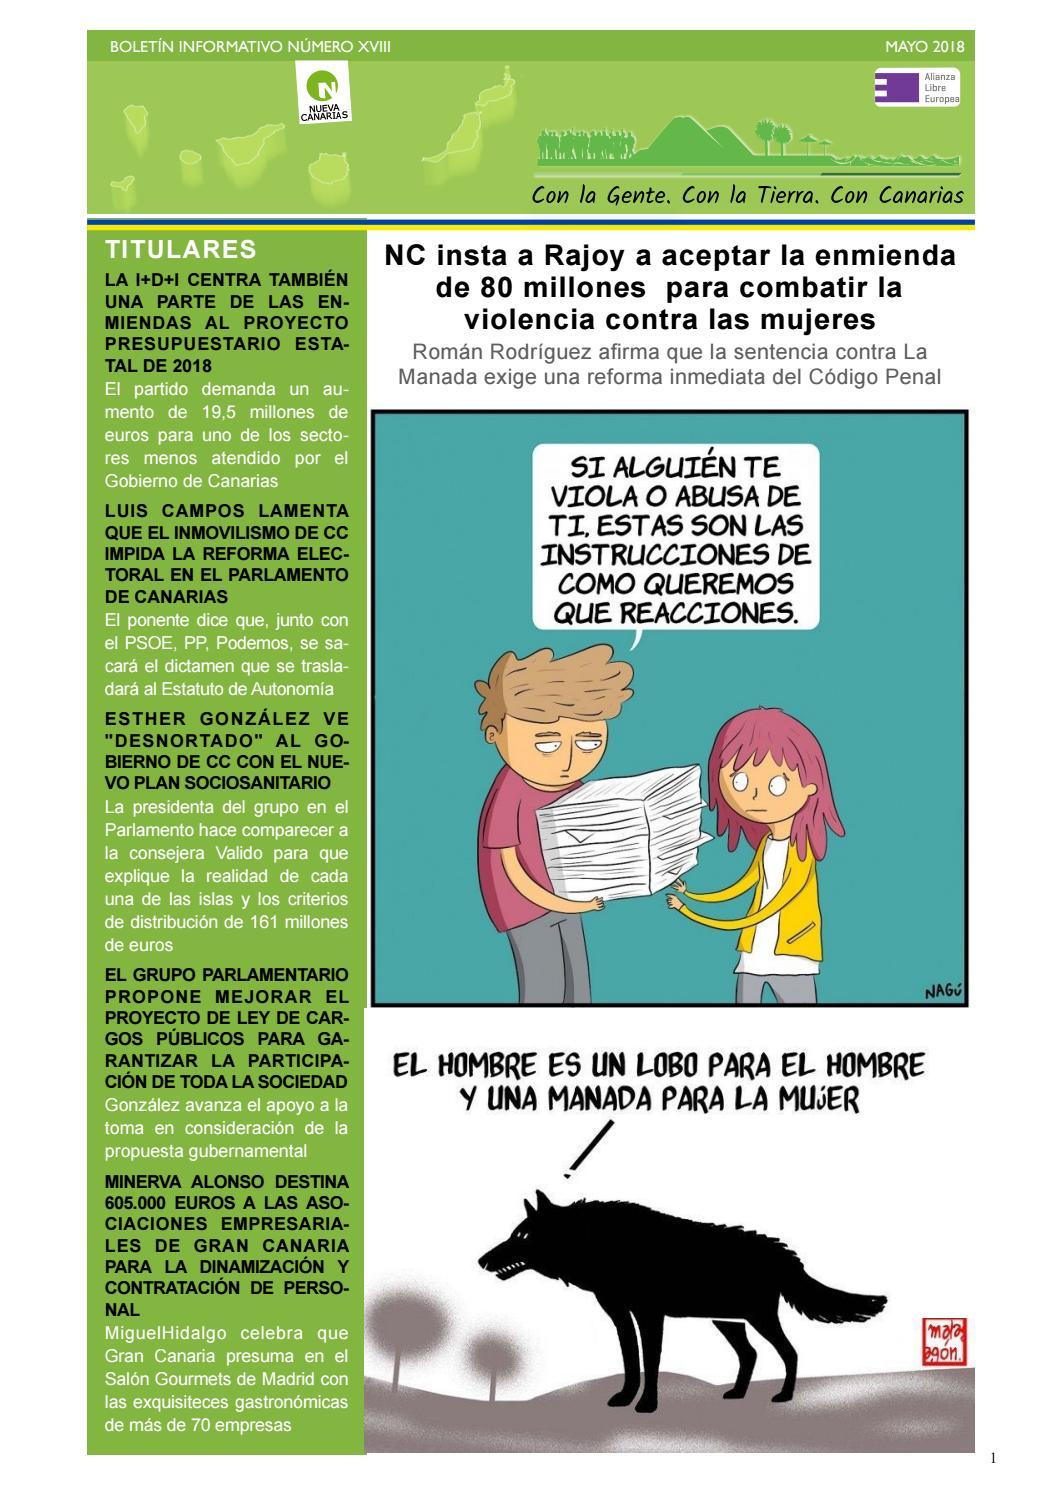 Boletín XVIII mayo 2018 by Nueva Canarias - issuu